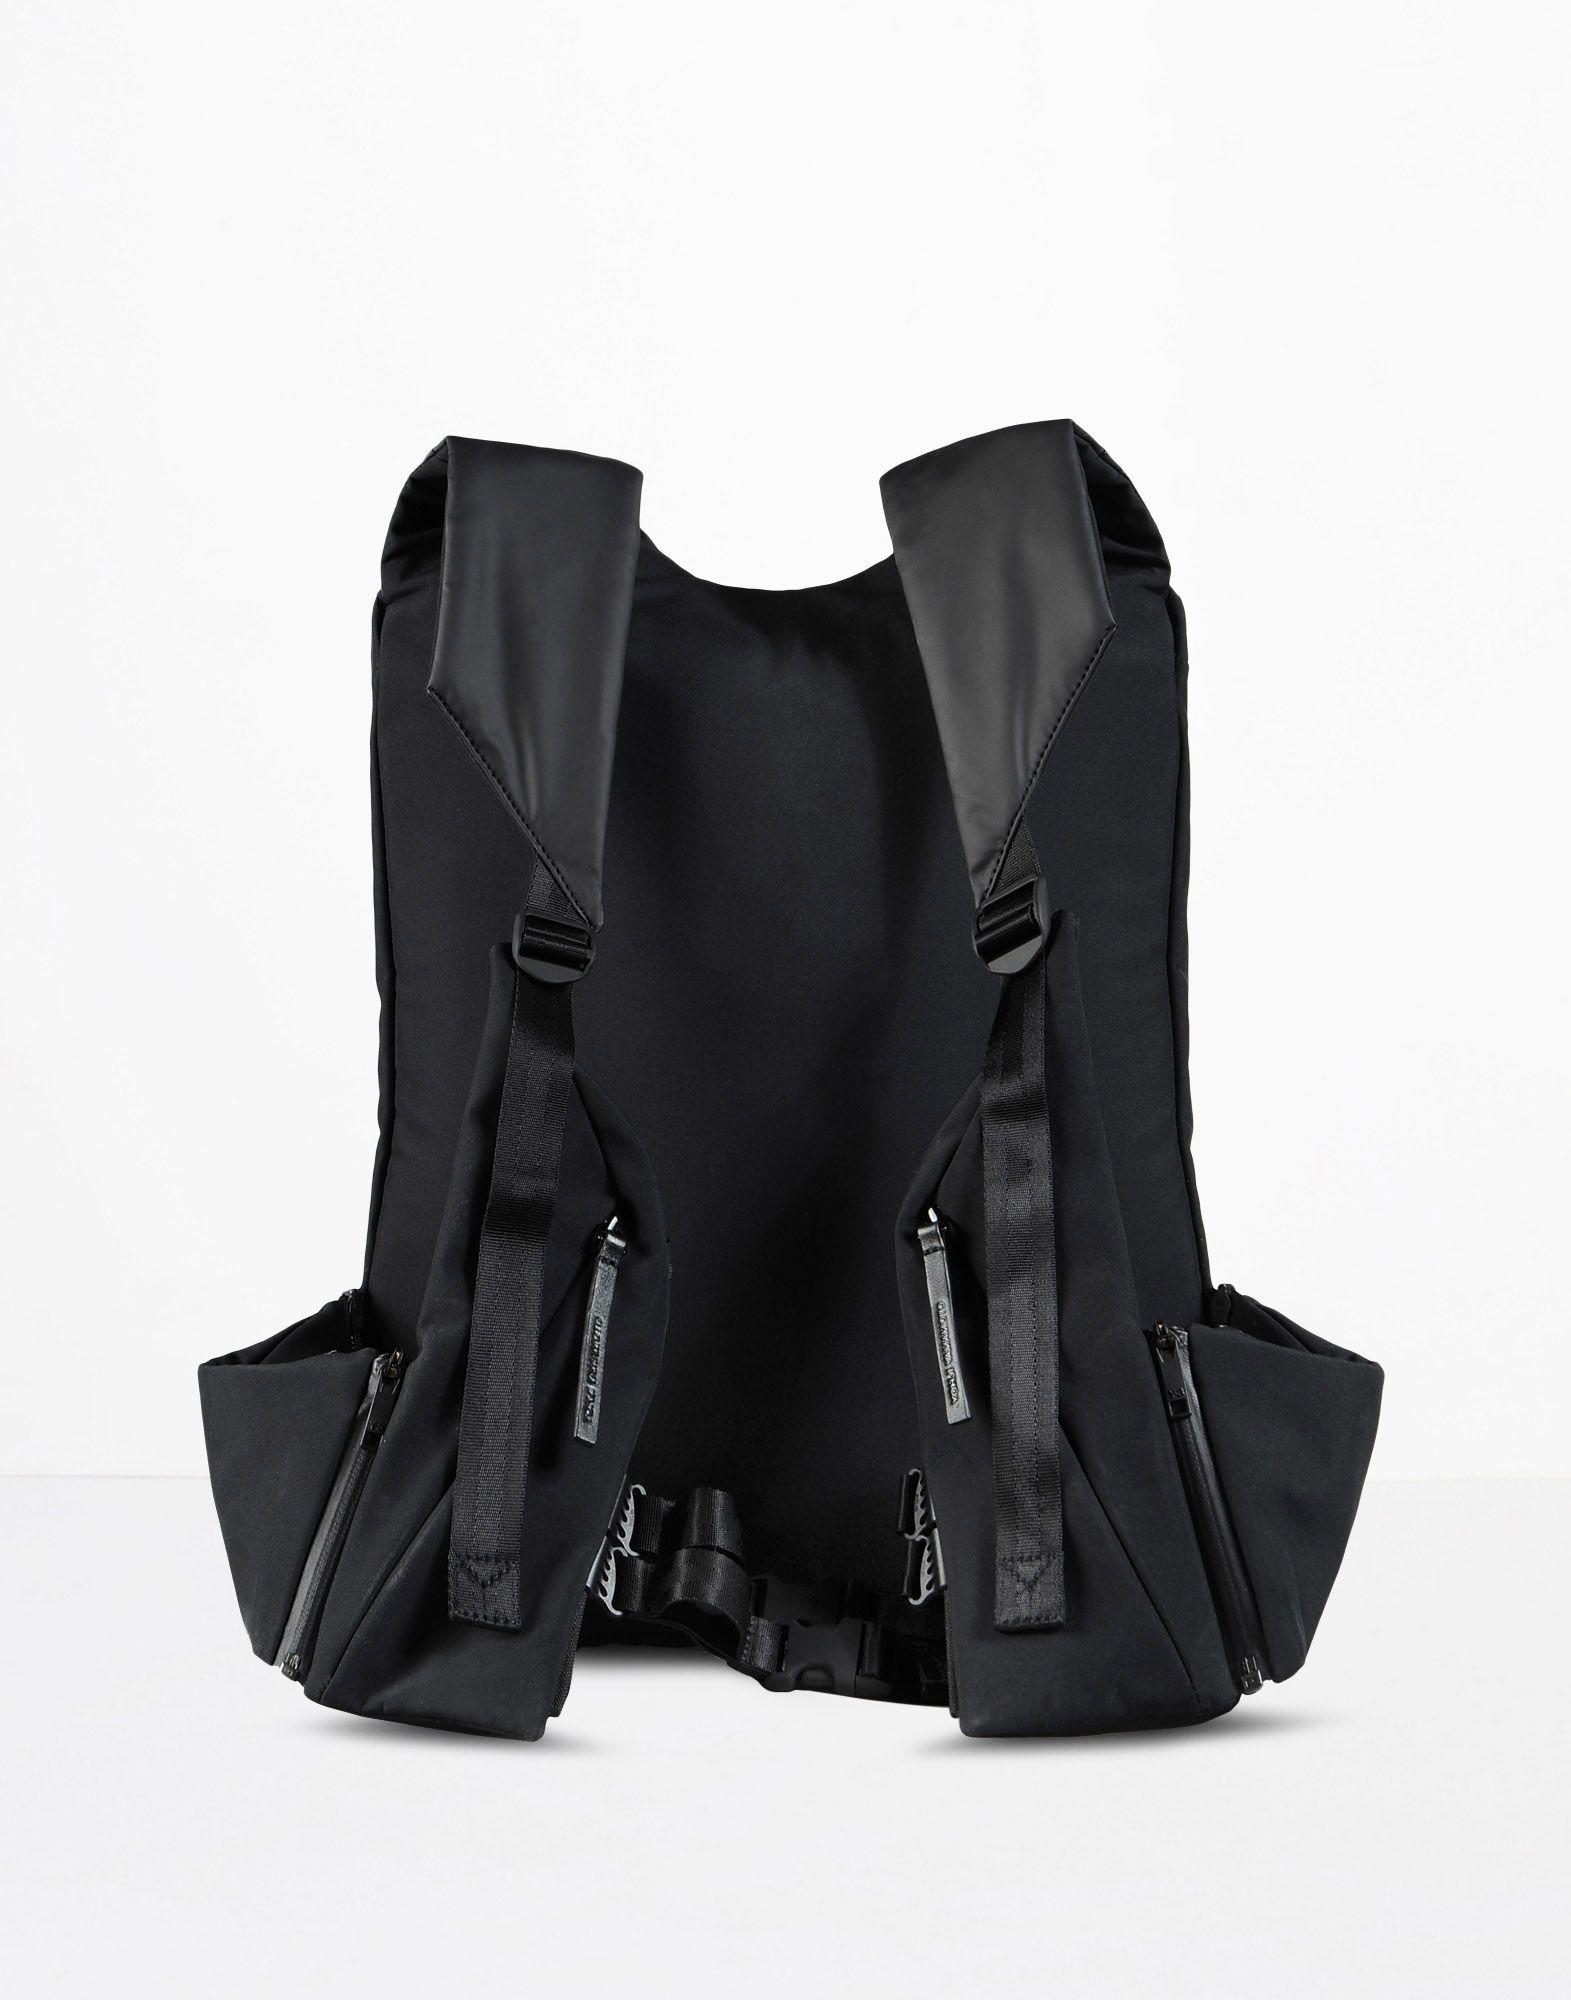 465690d6b8b2 ... Y-3 Y-3 QASA VEST Backpack E e ...